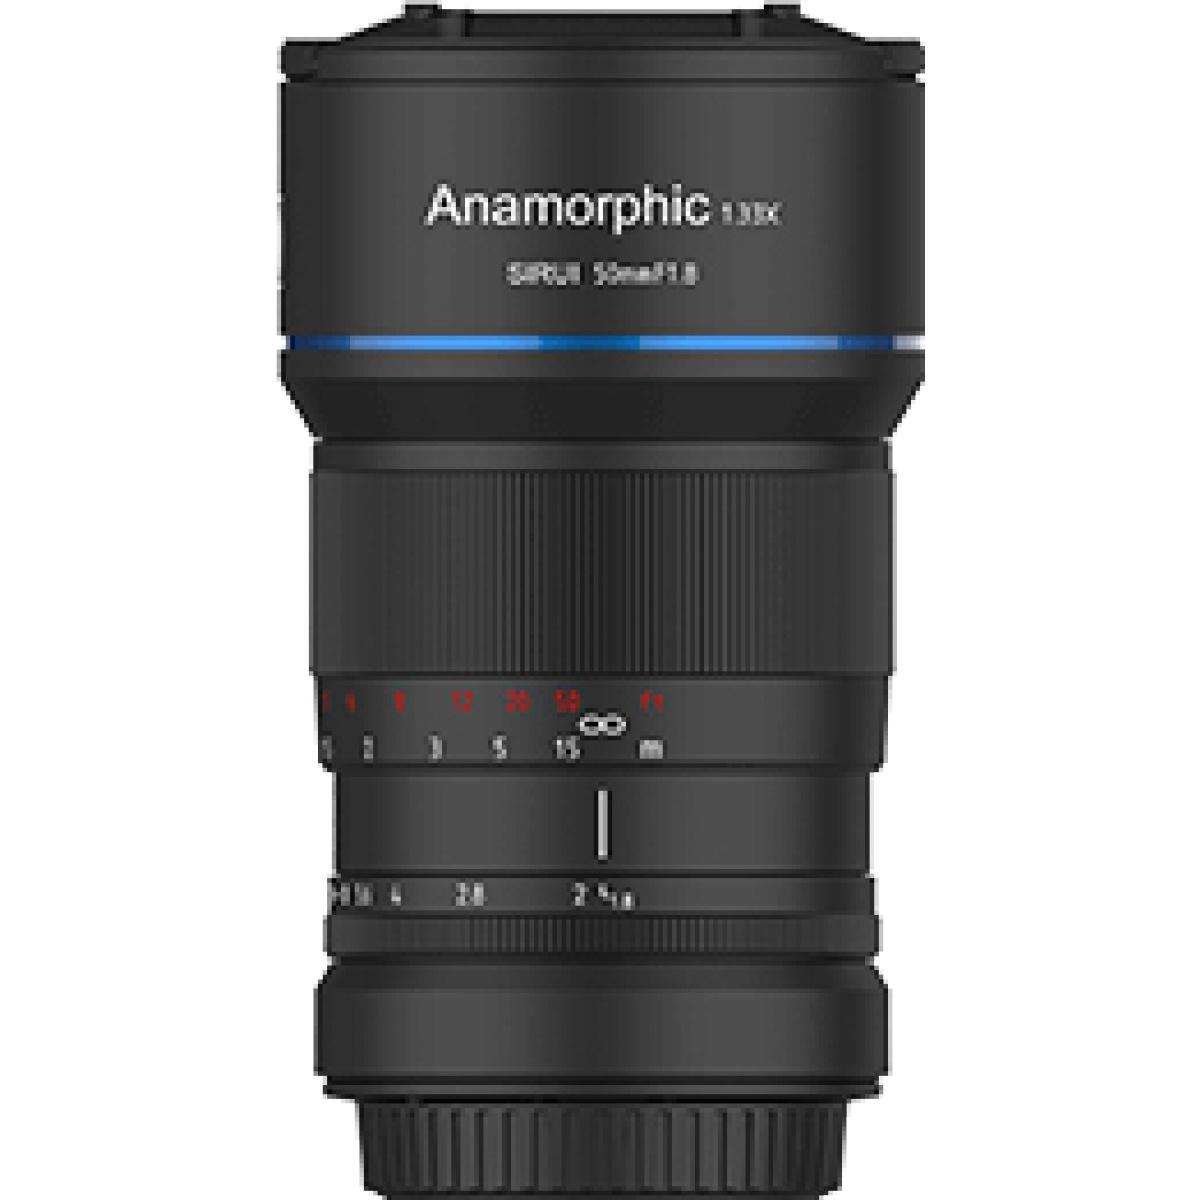 Sirui 50 mm 1:1,8 1.33X Anamorph X-Mount